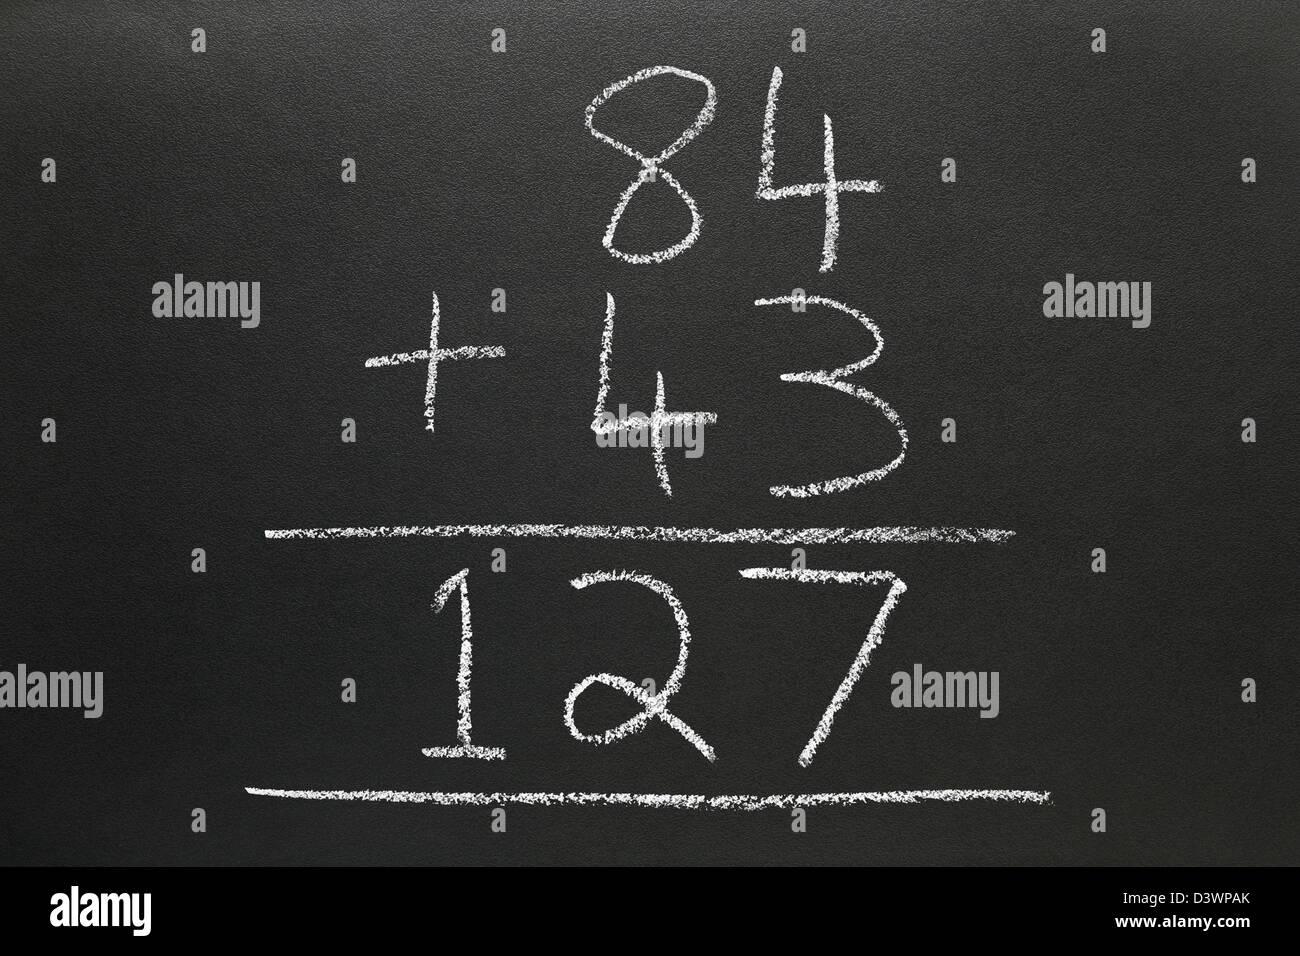 A basic addition sum written on a blackboard. - Stock Image